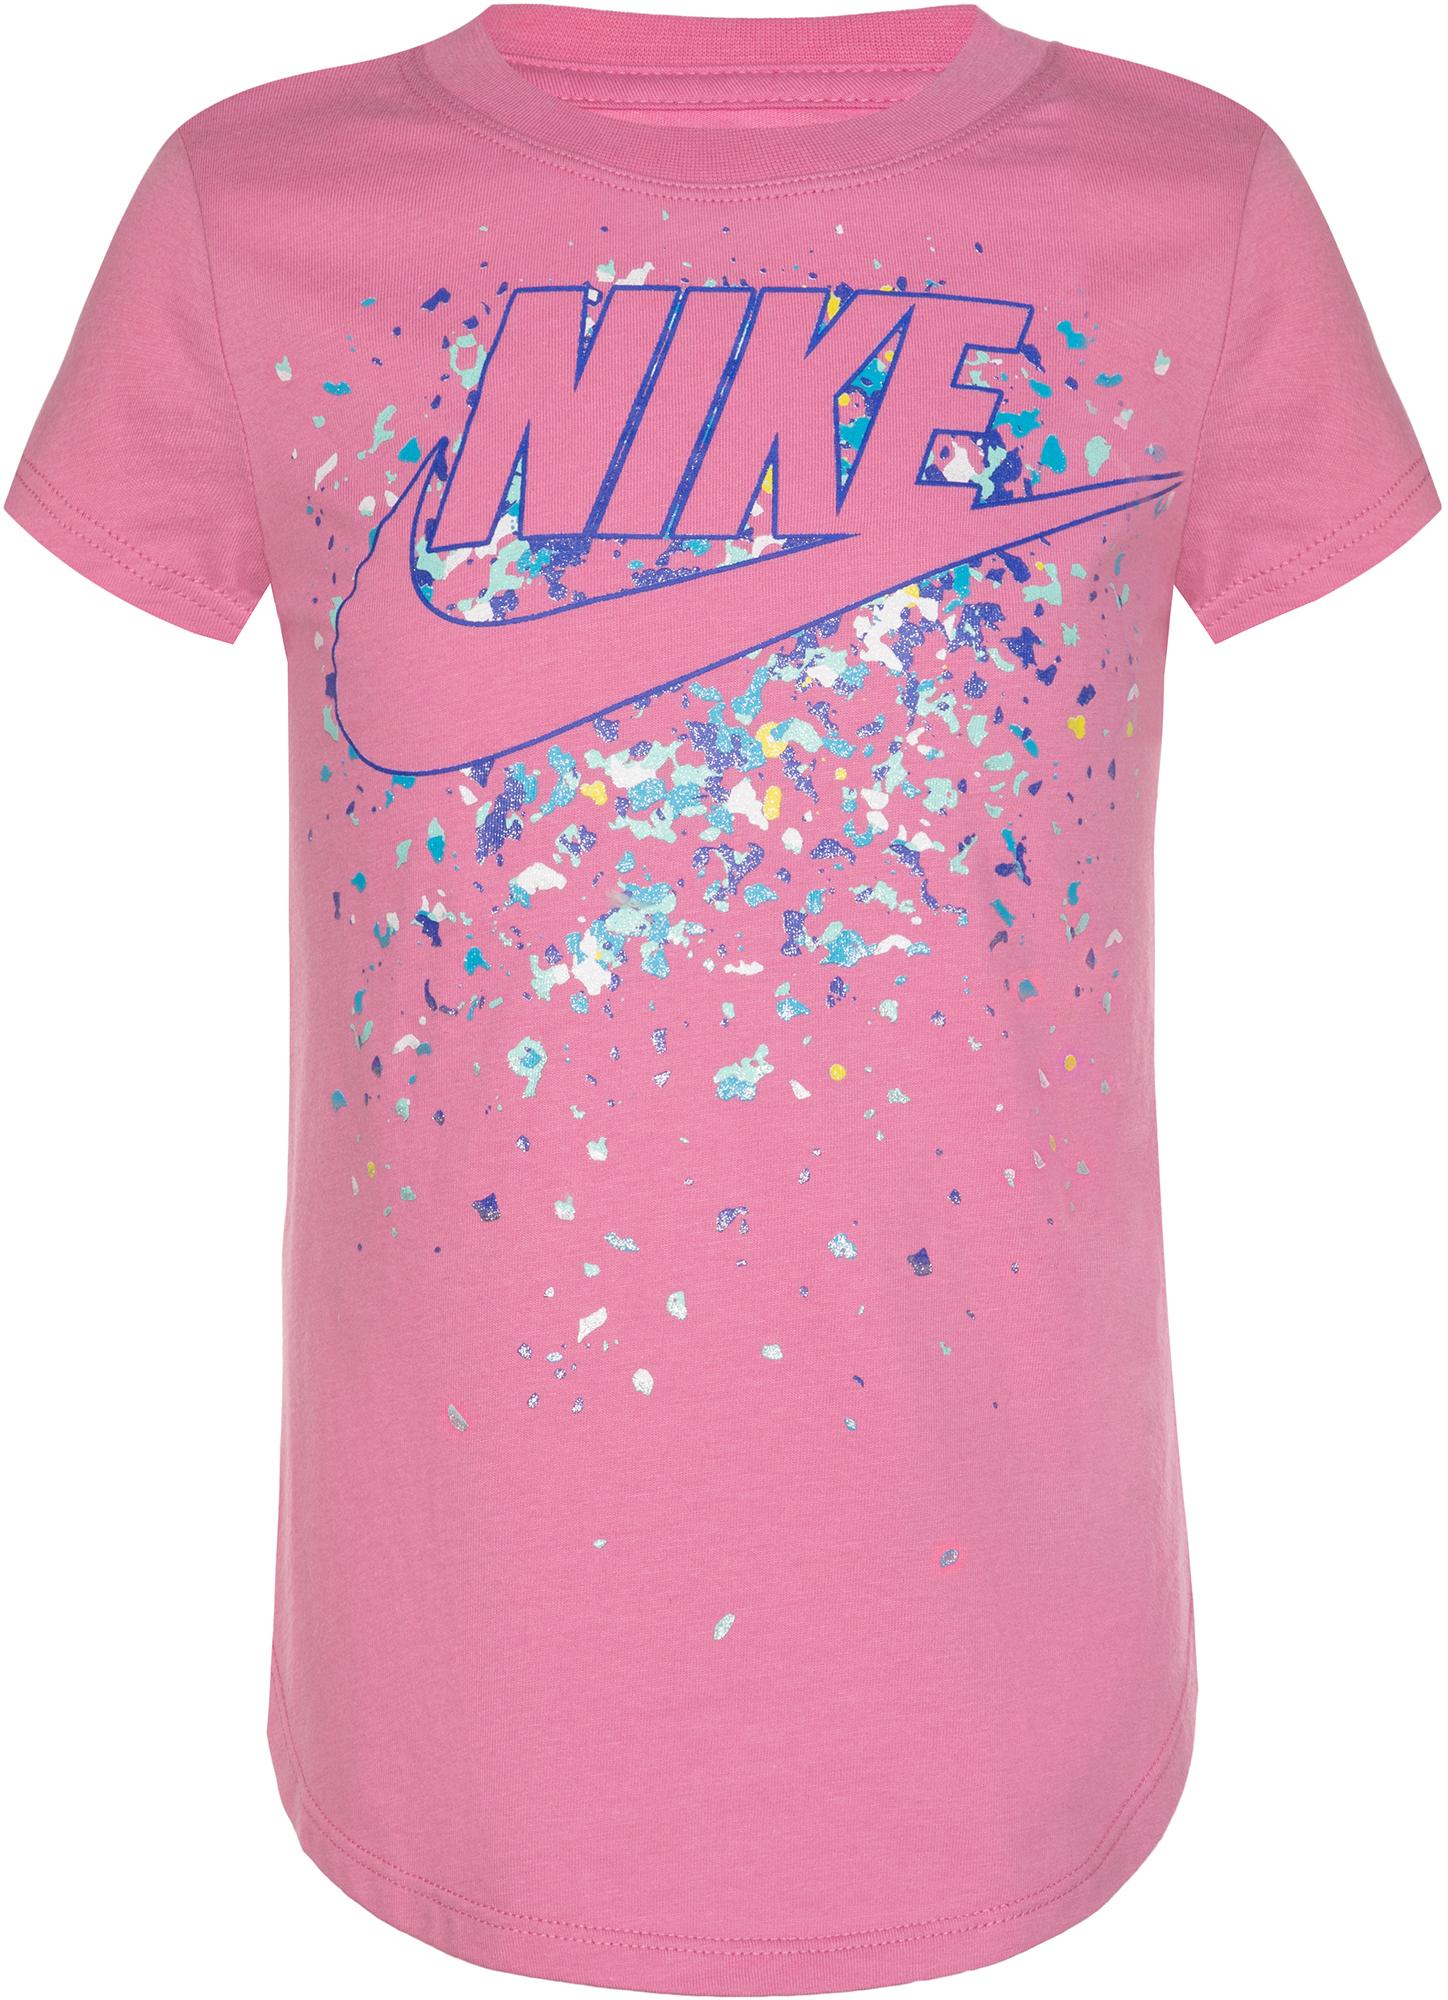 Nike Футболка для девочек Nike Futura Regrind Waterfall, размер 104